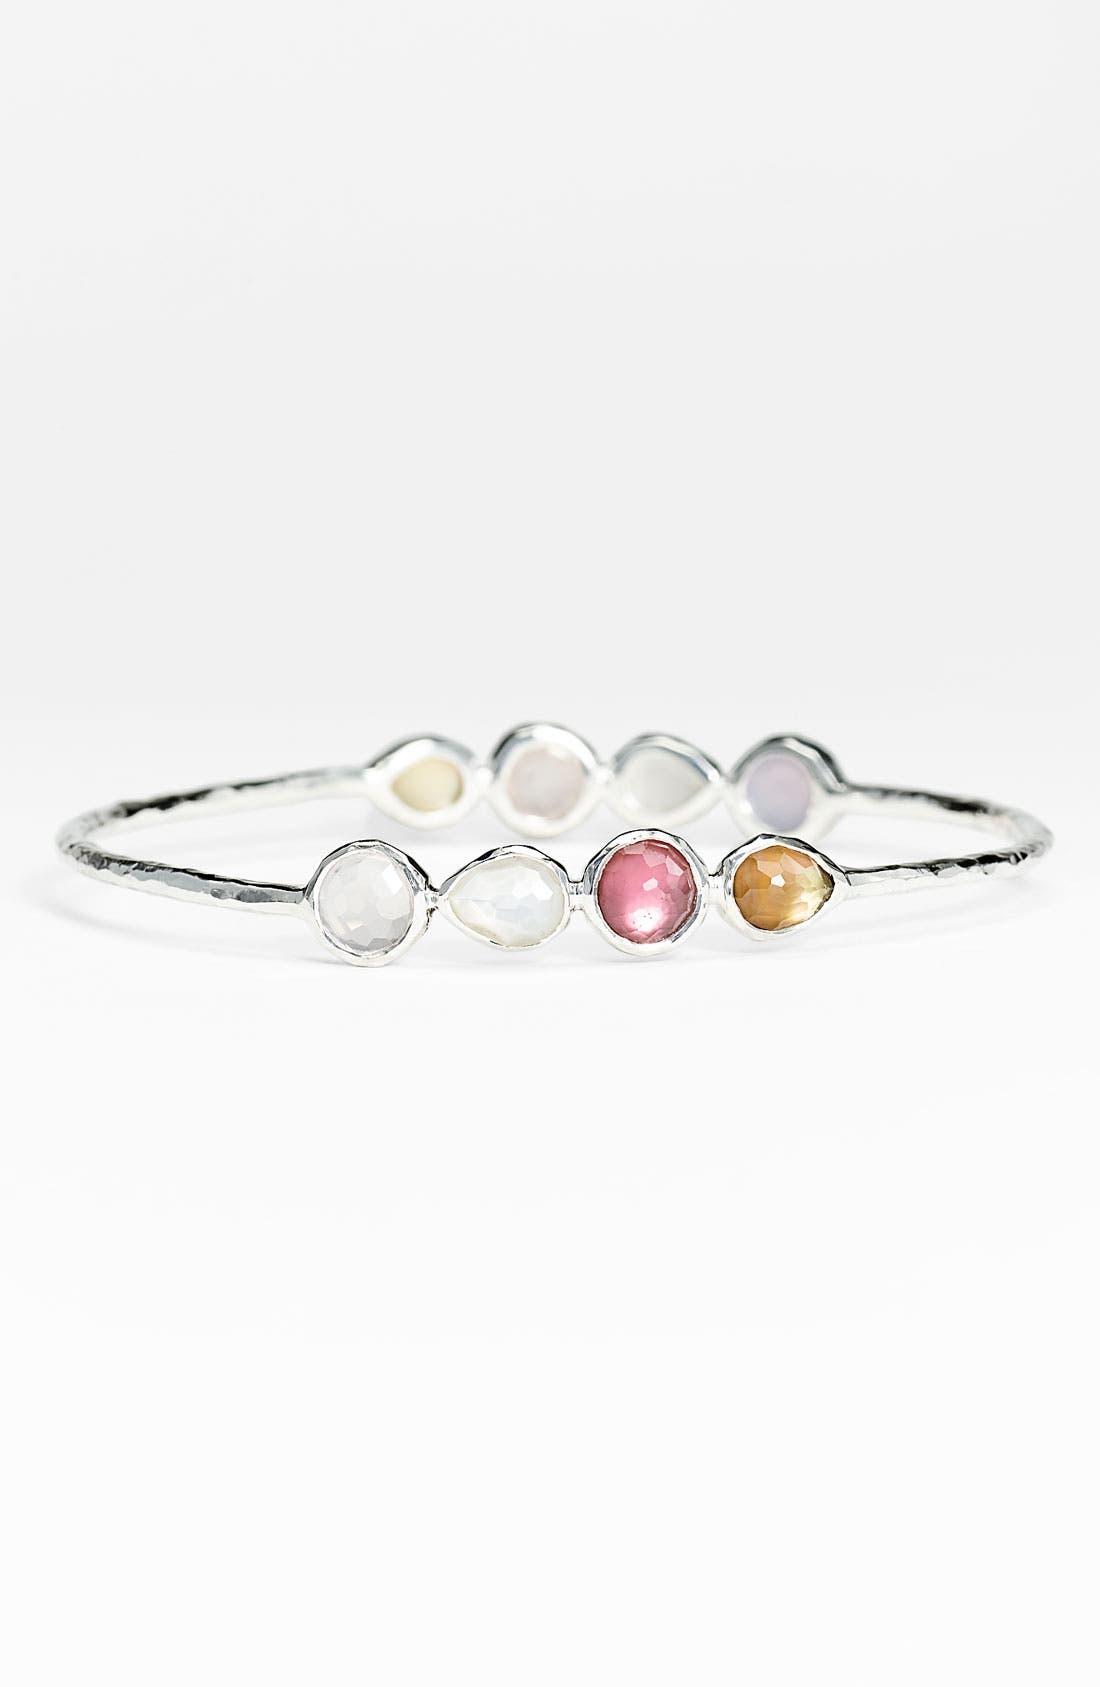 Alternate Image 1 Selected - Ippolita 'Candy Wonderland' 8-Stone Cluster Bangle